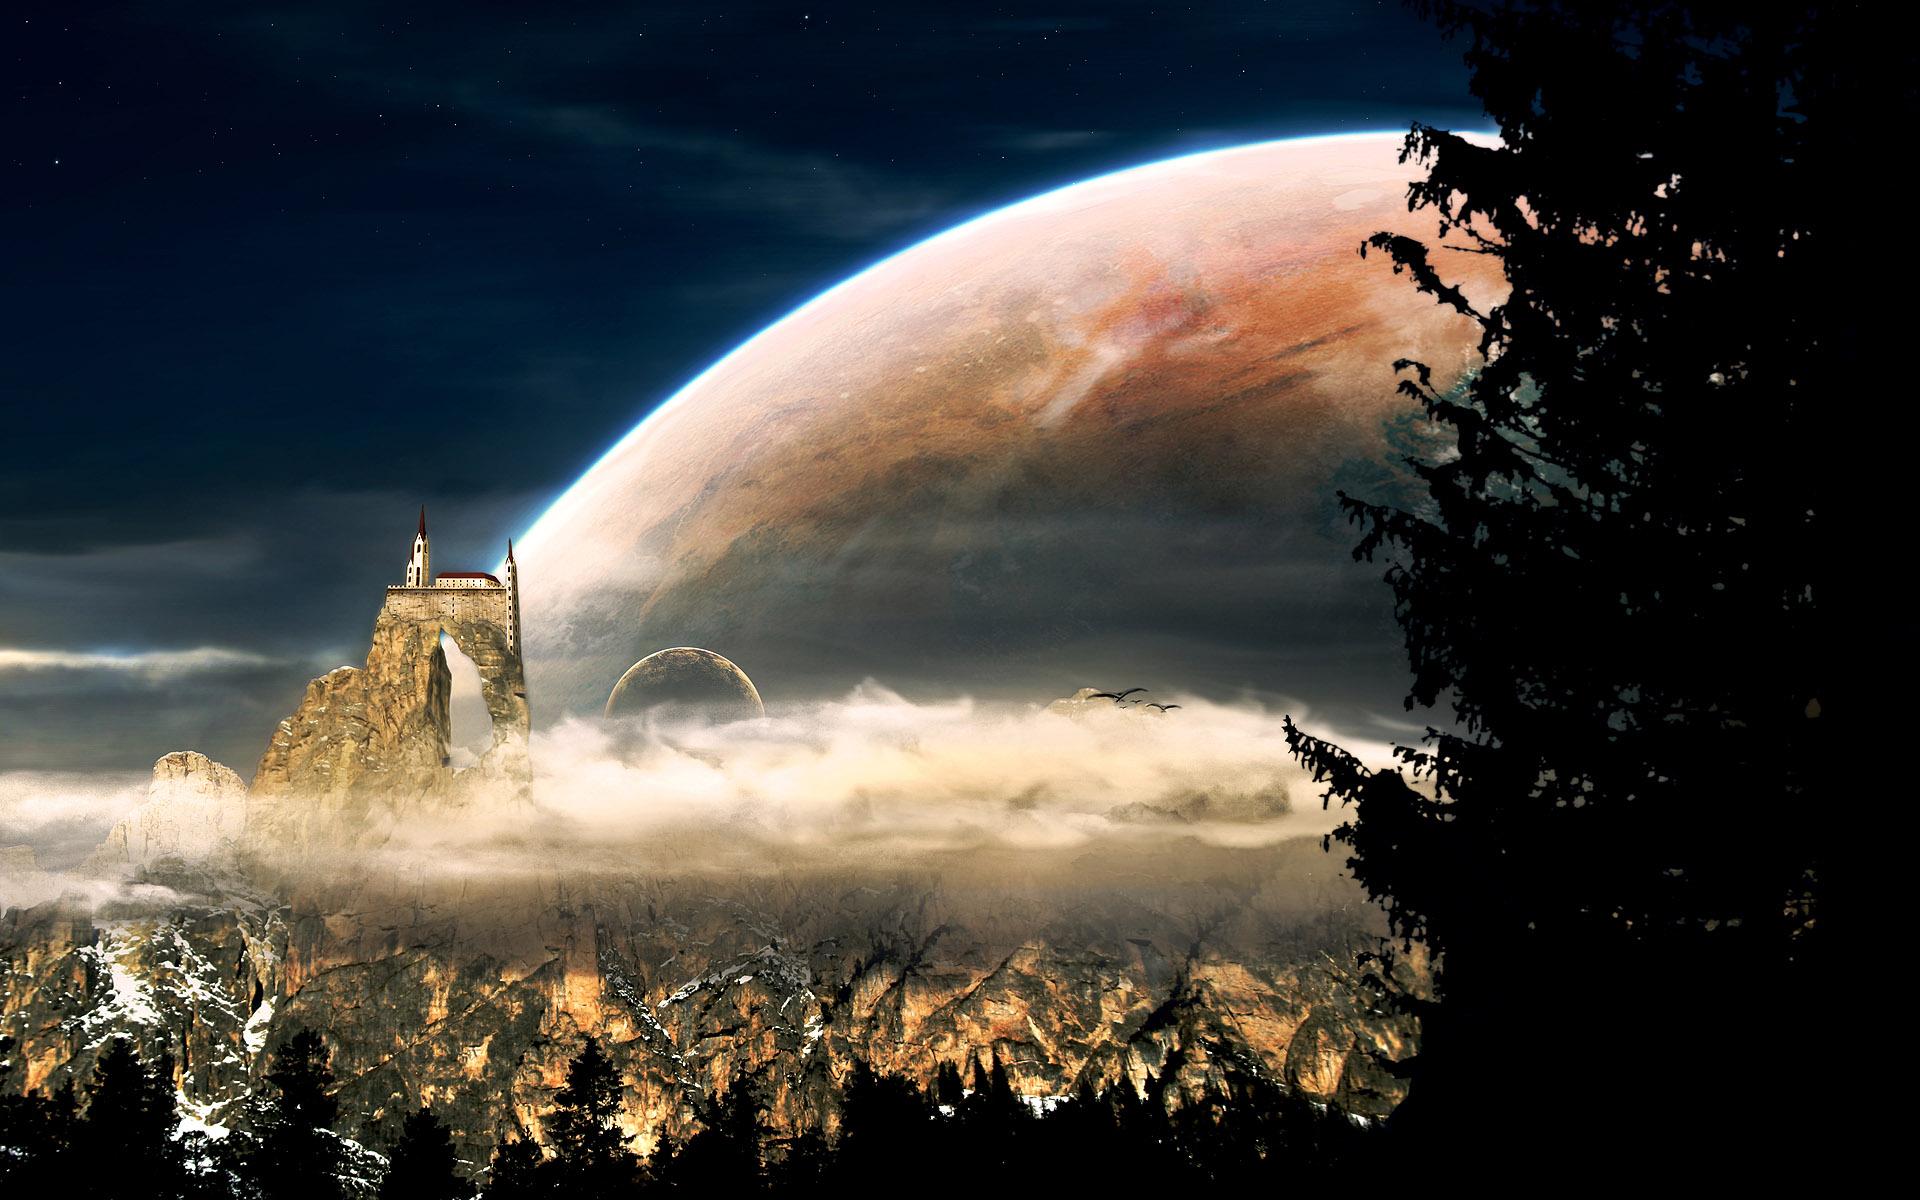 Space Planet Wallpaper Background PC Dekstop 1920x1200